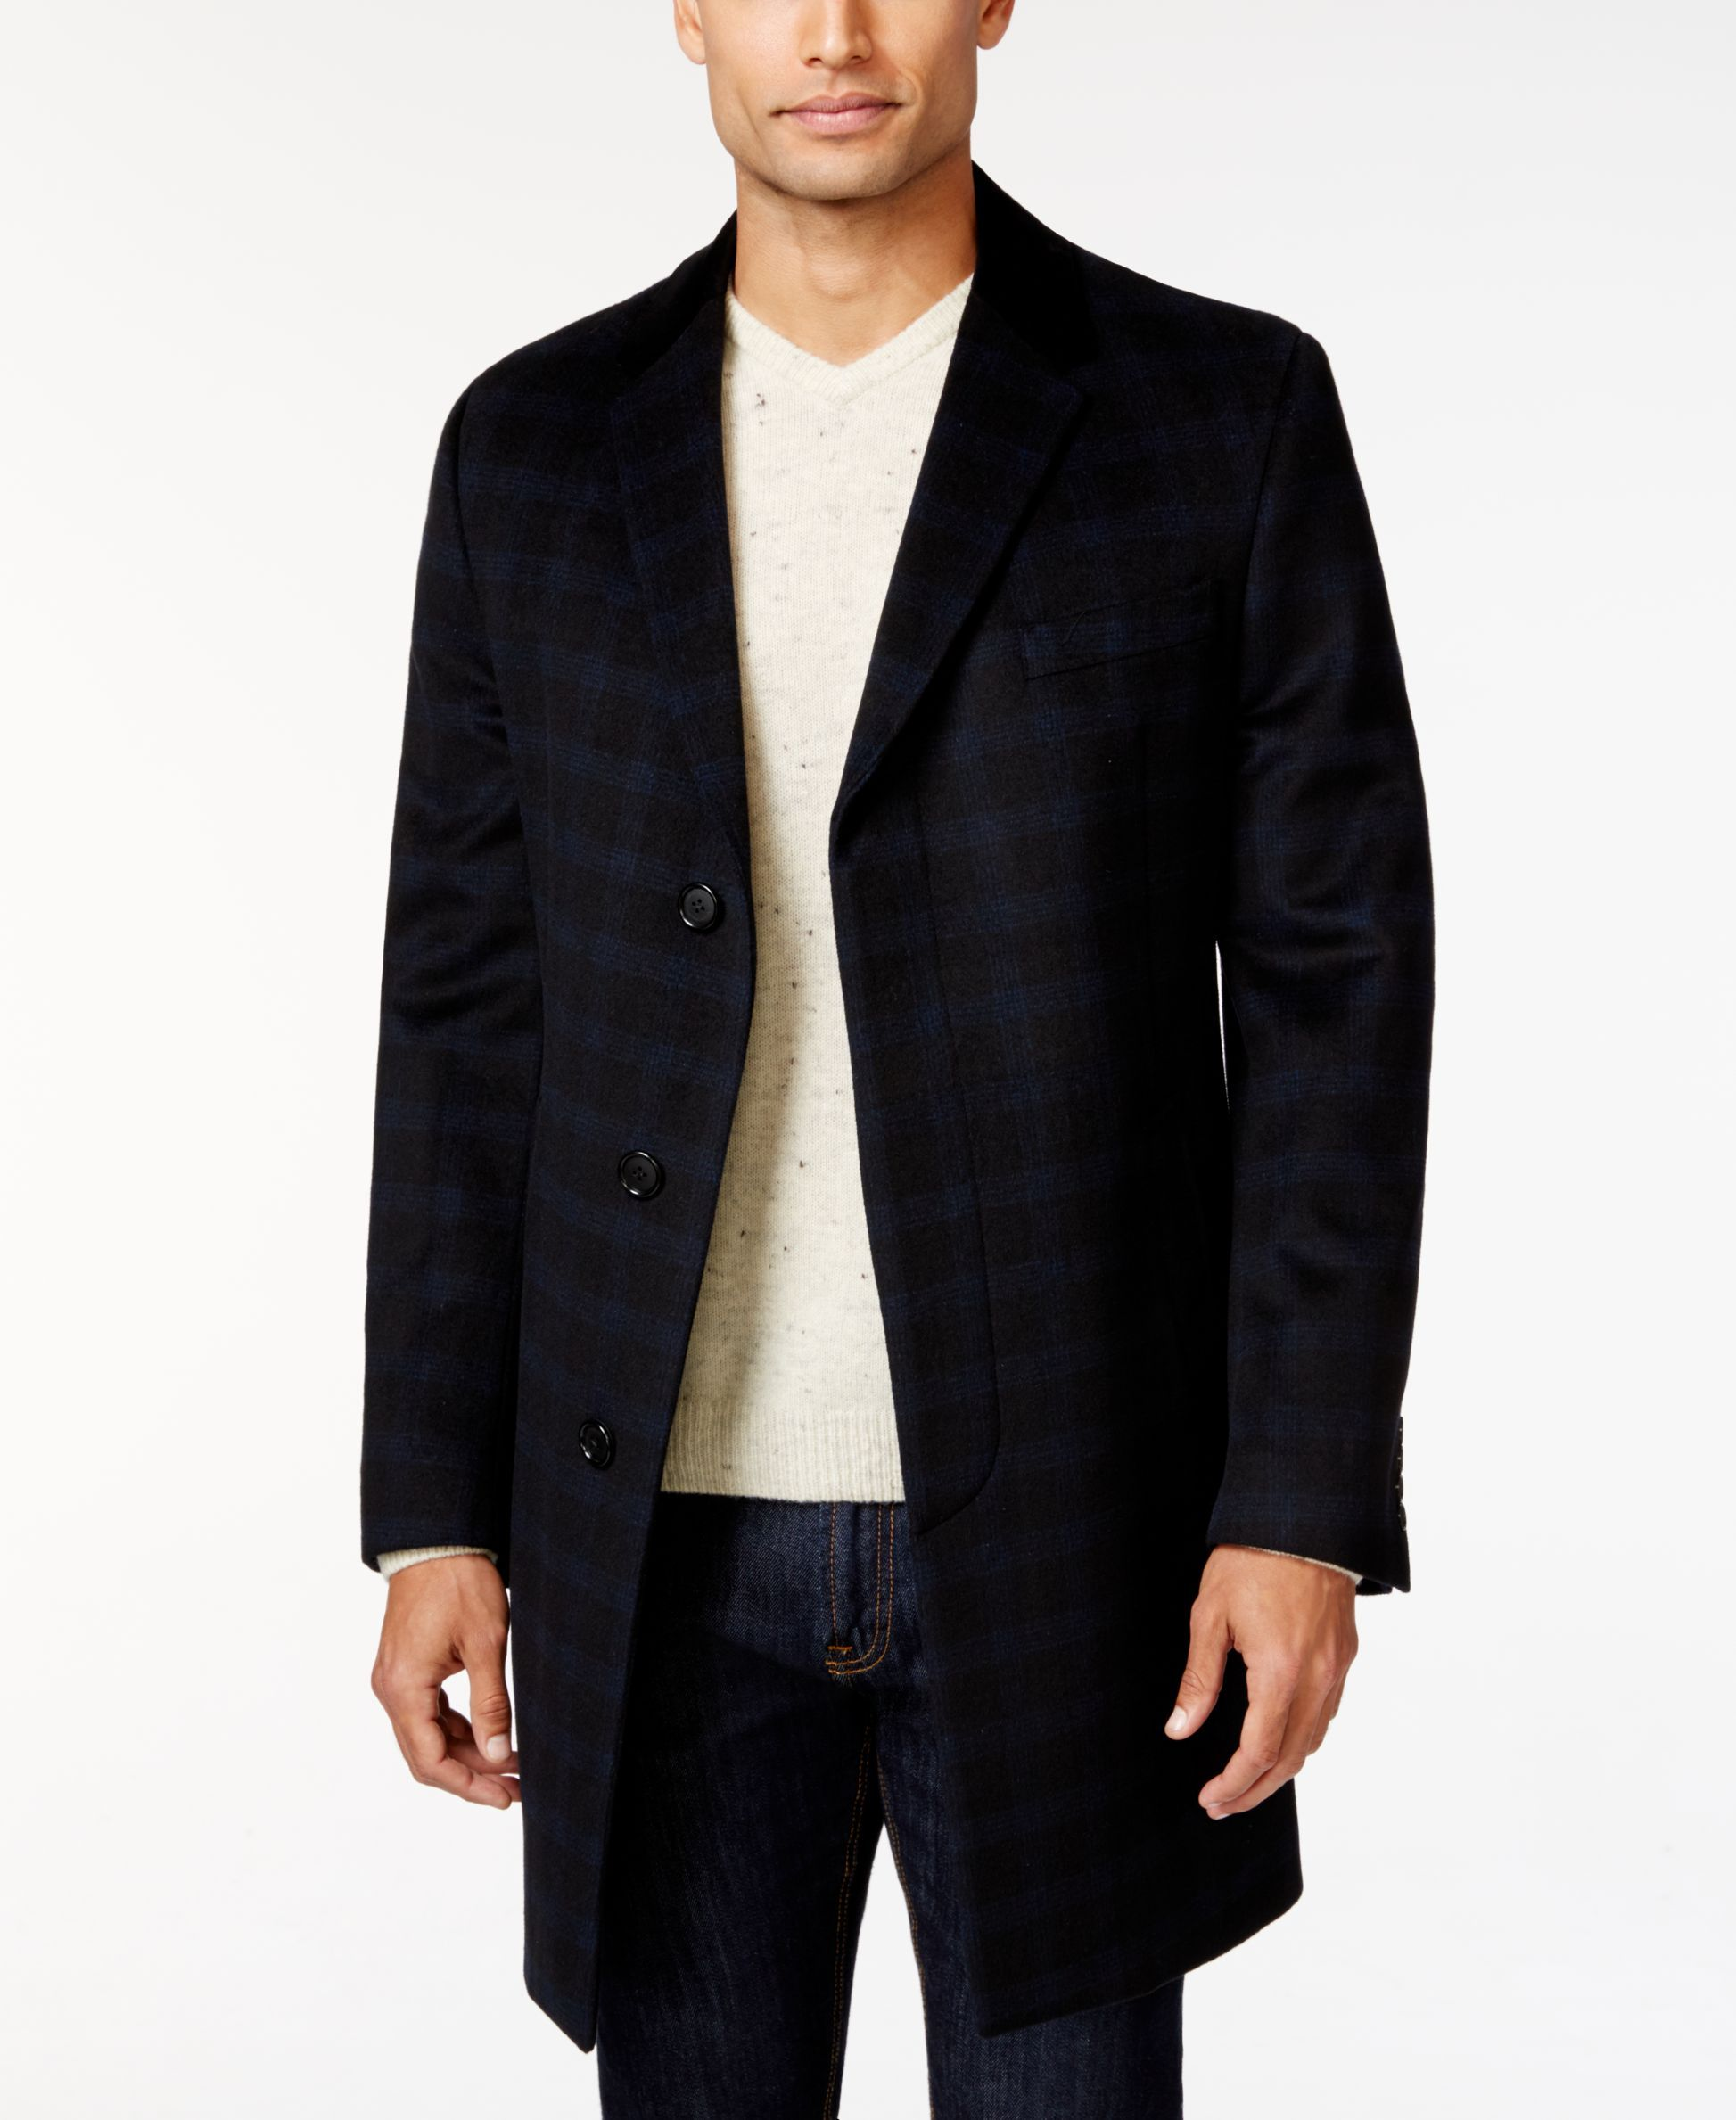 Tommy Hilfiger Bleeker Chesterfield Slim Fit Overcoat Coats Jackets Men Macy S Tommy Hilfiger Overcoats Fashion [ 2378 x 1947 Pixel ]